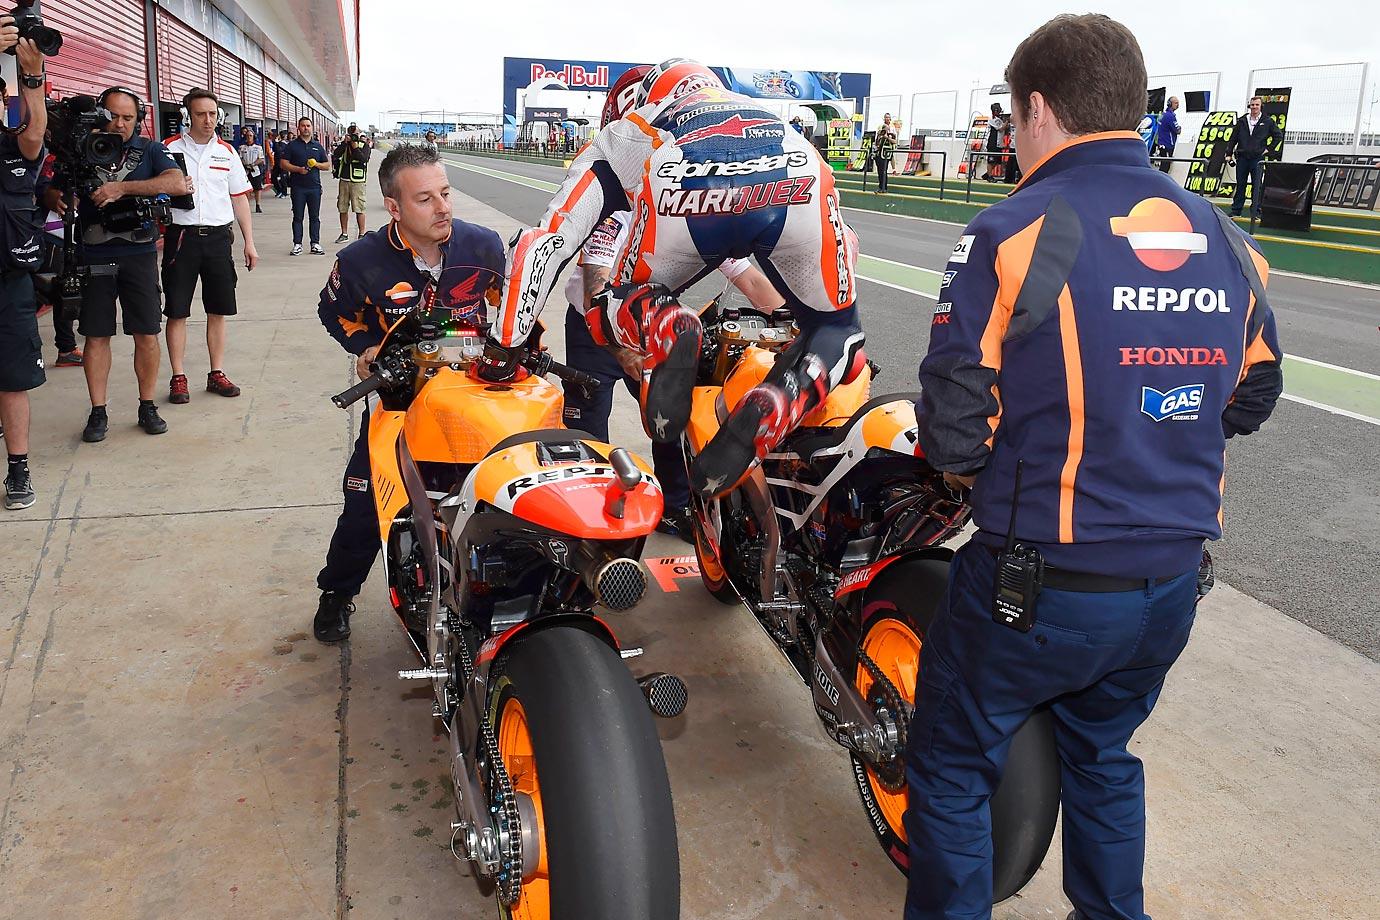 Marc Marquez leaps onto a new bike during the Moto GP in Termas de Rio Honda, Argentina.